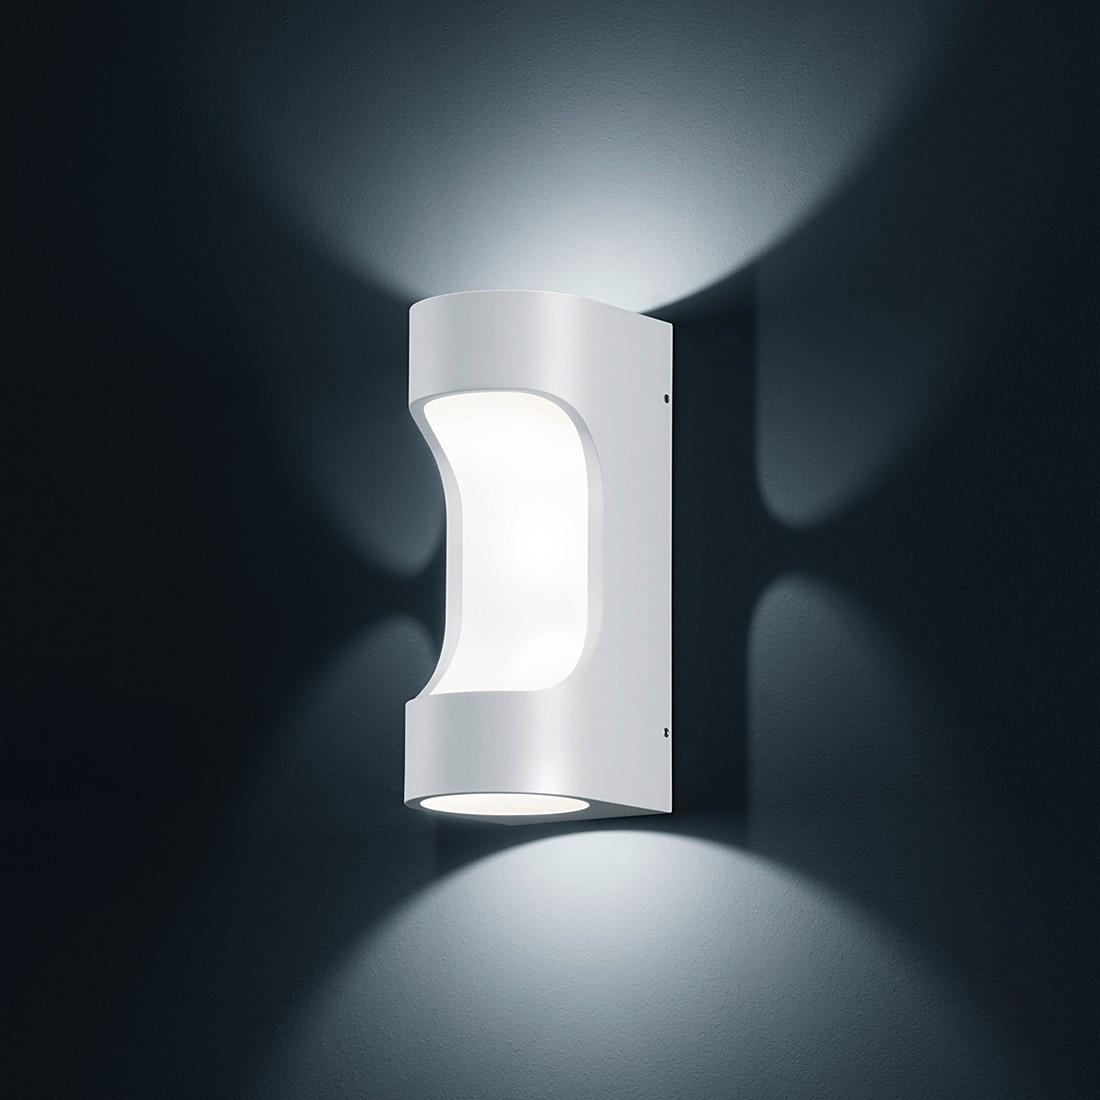 wandleuchte roc 44 metall wei helestra a g nstig. Black Bedroom Furniture Sets. Home Design Ideas